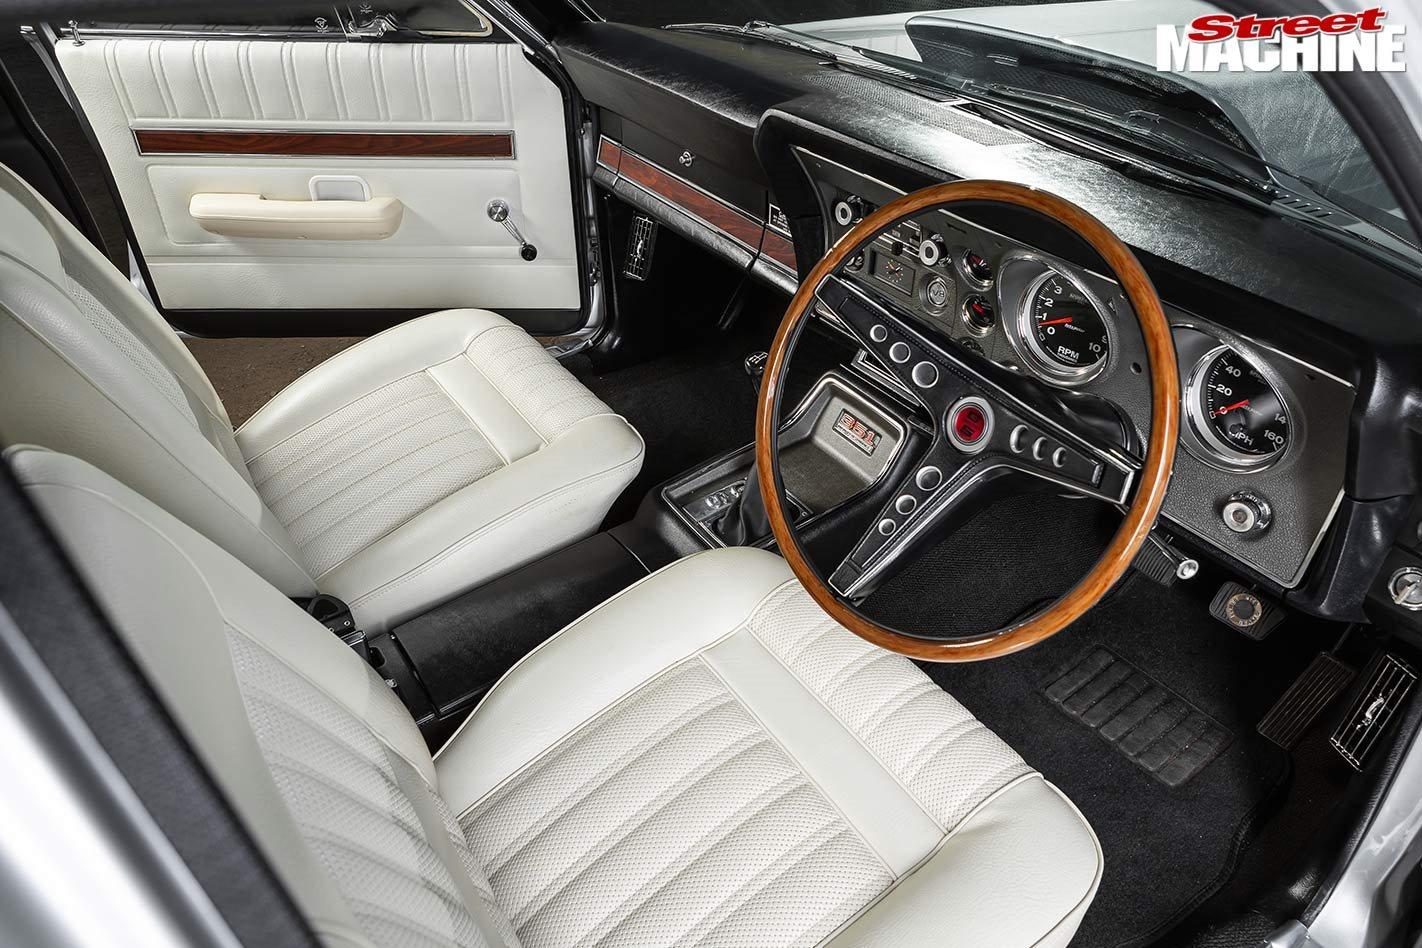 600hp 1971 Ford XY Falcon - TUFFGS